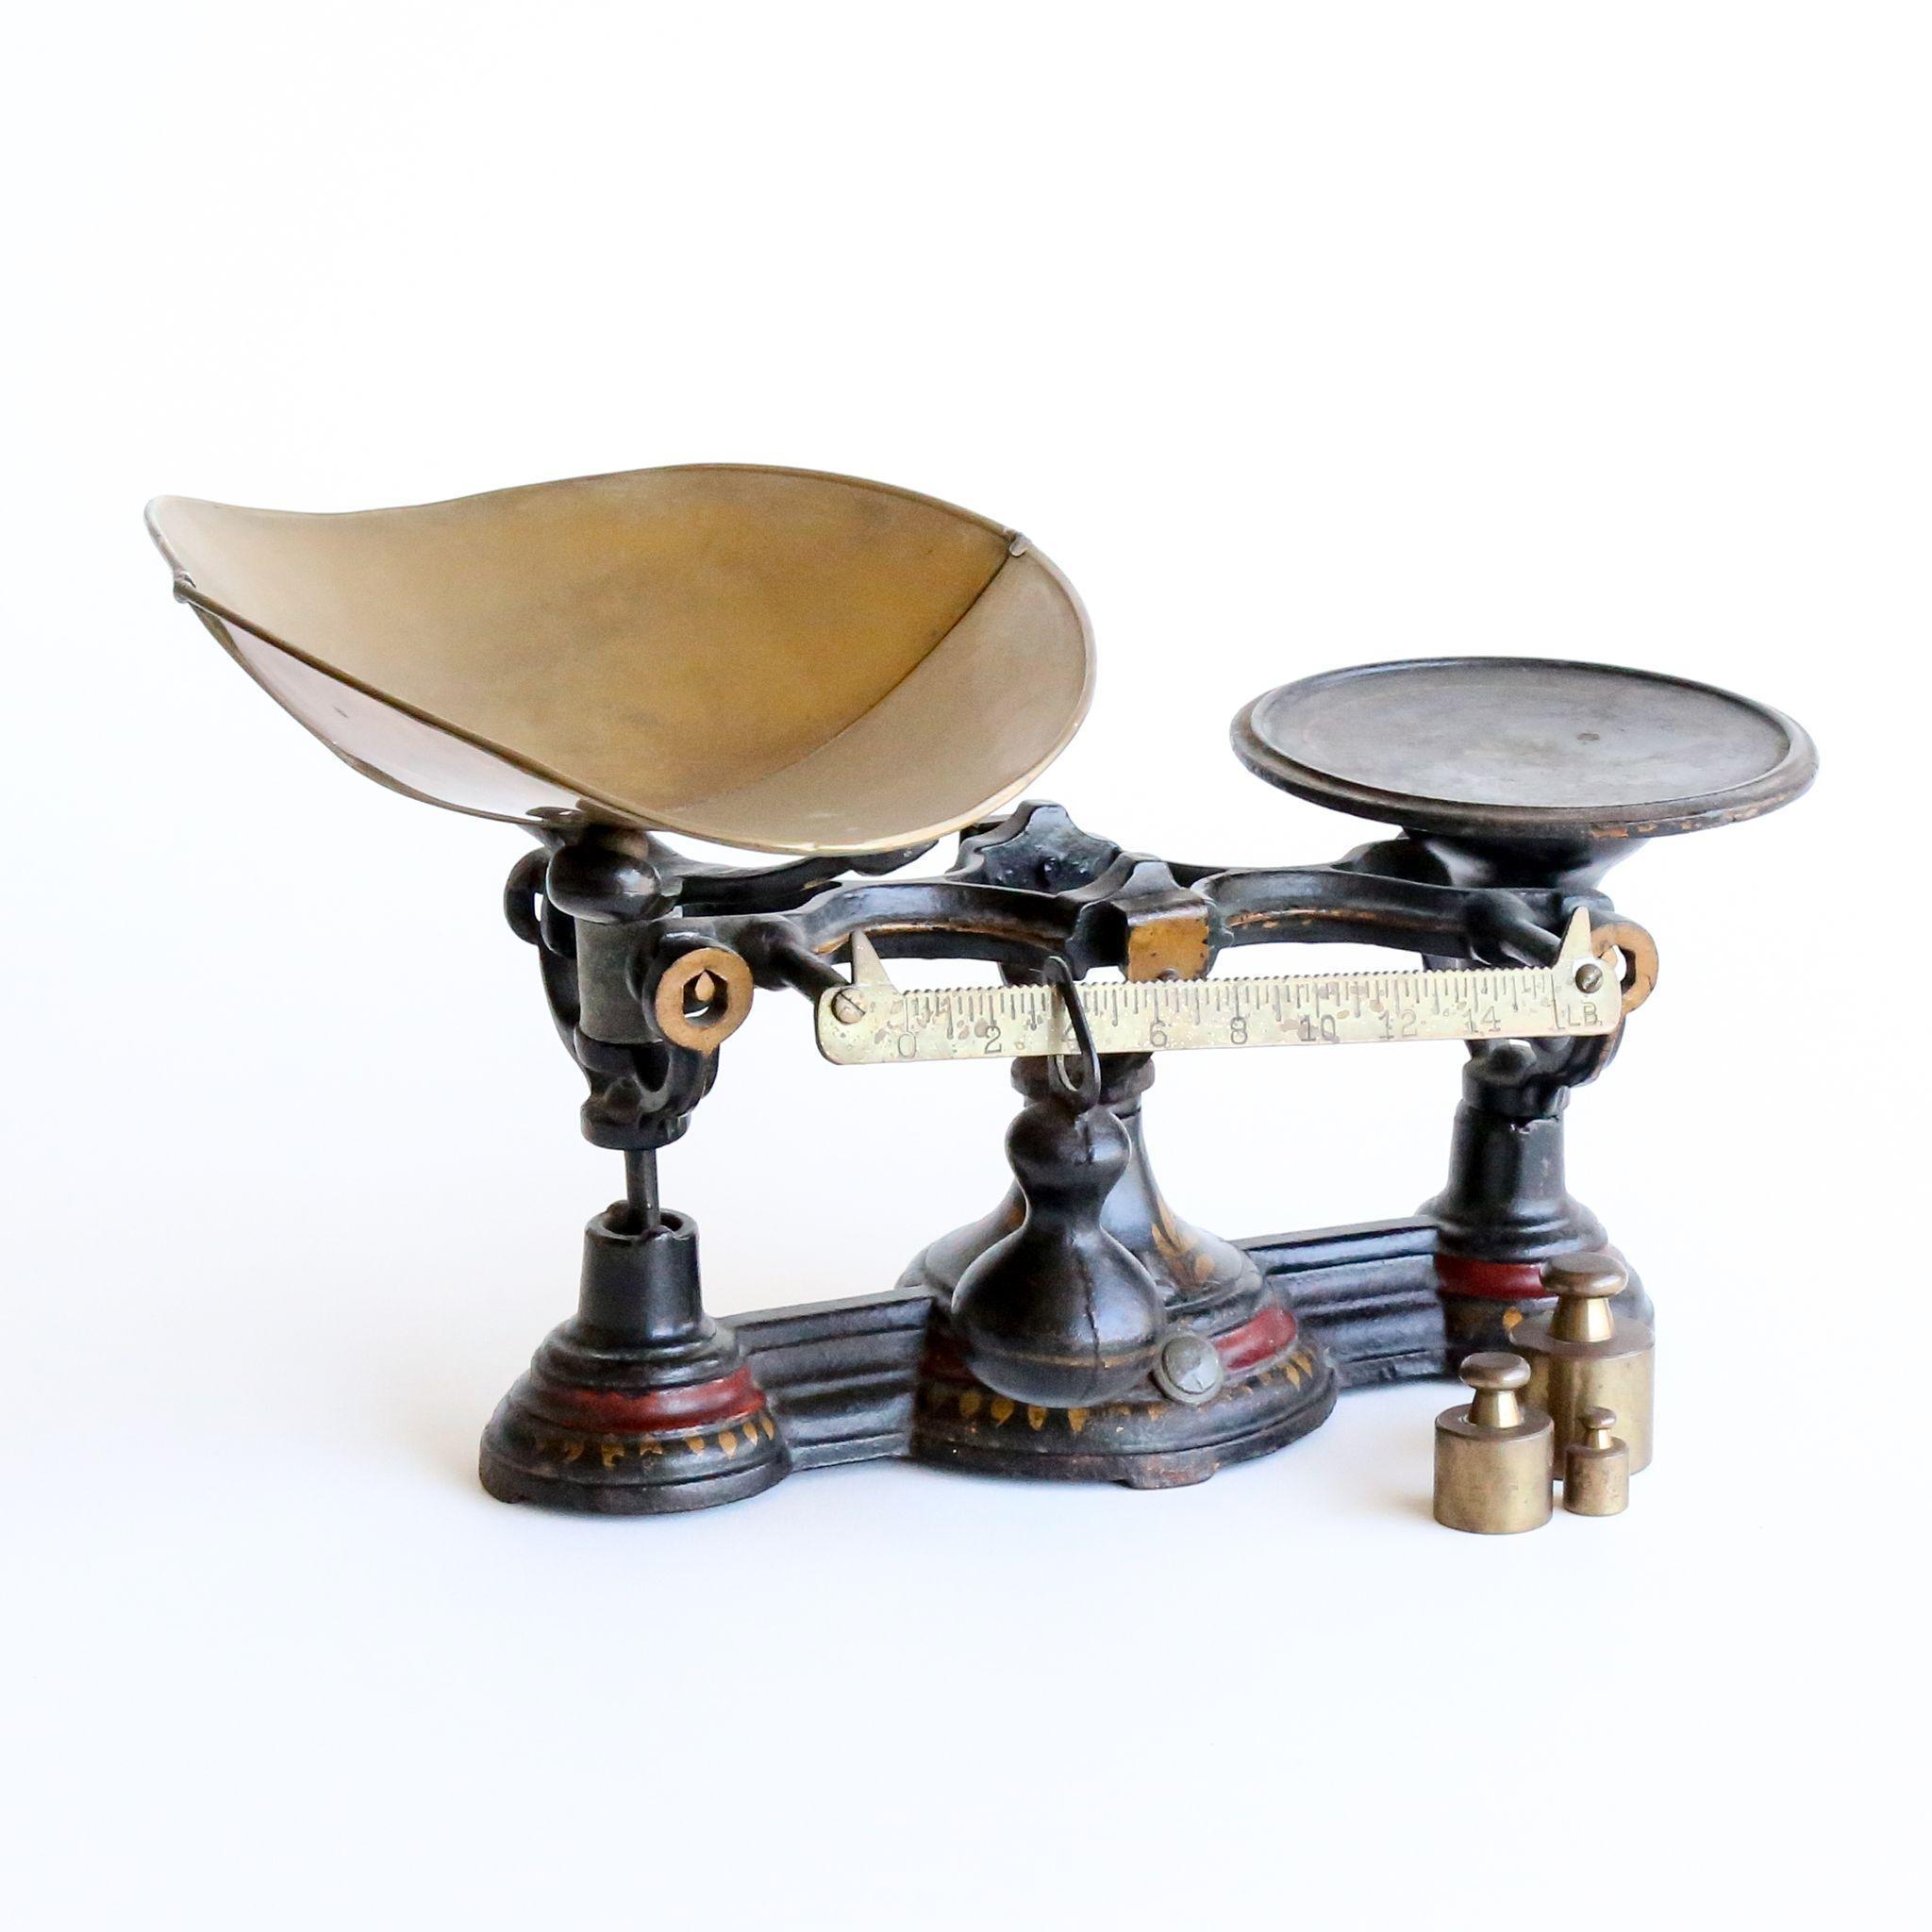 Circa 1860 Antique Victorian Brass & Iron Scales